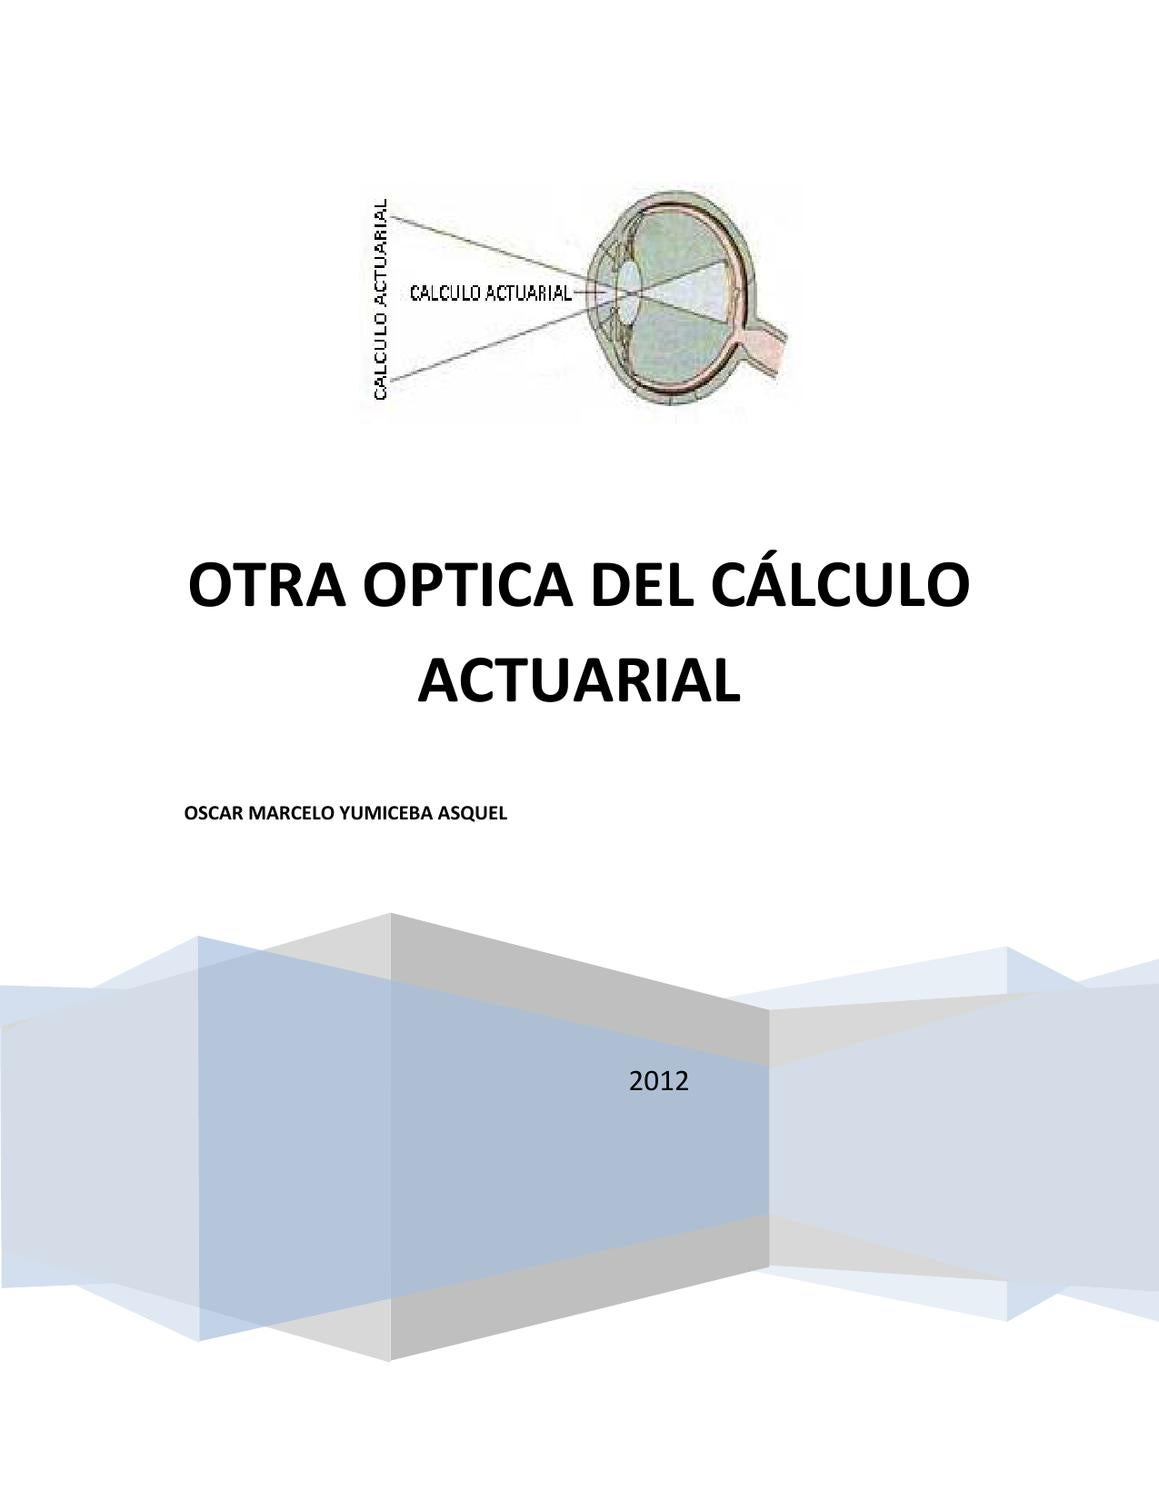 OTRA OPTICA DEL CALCULO ACTUARIAL by Marcelo Yumiceba - issuu